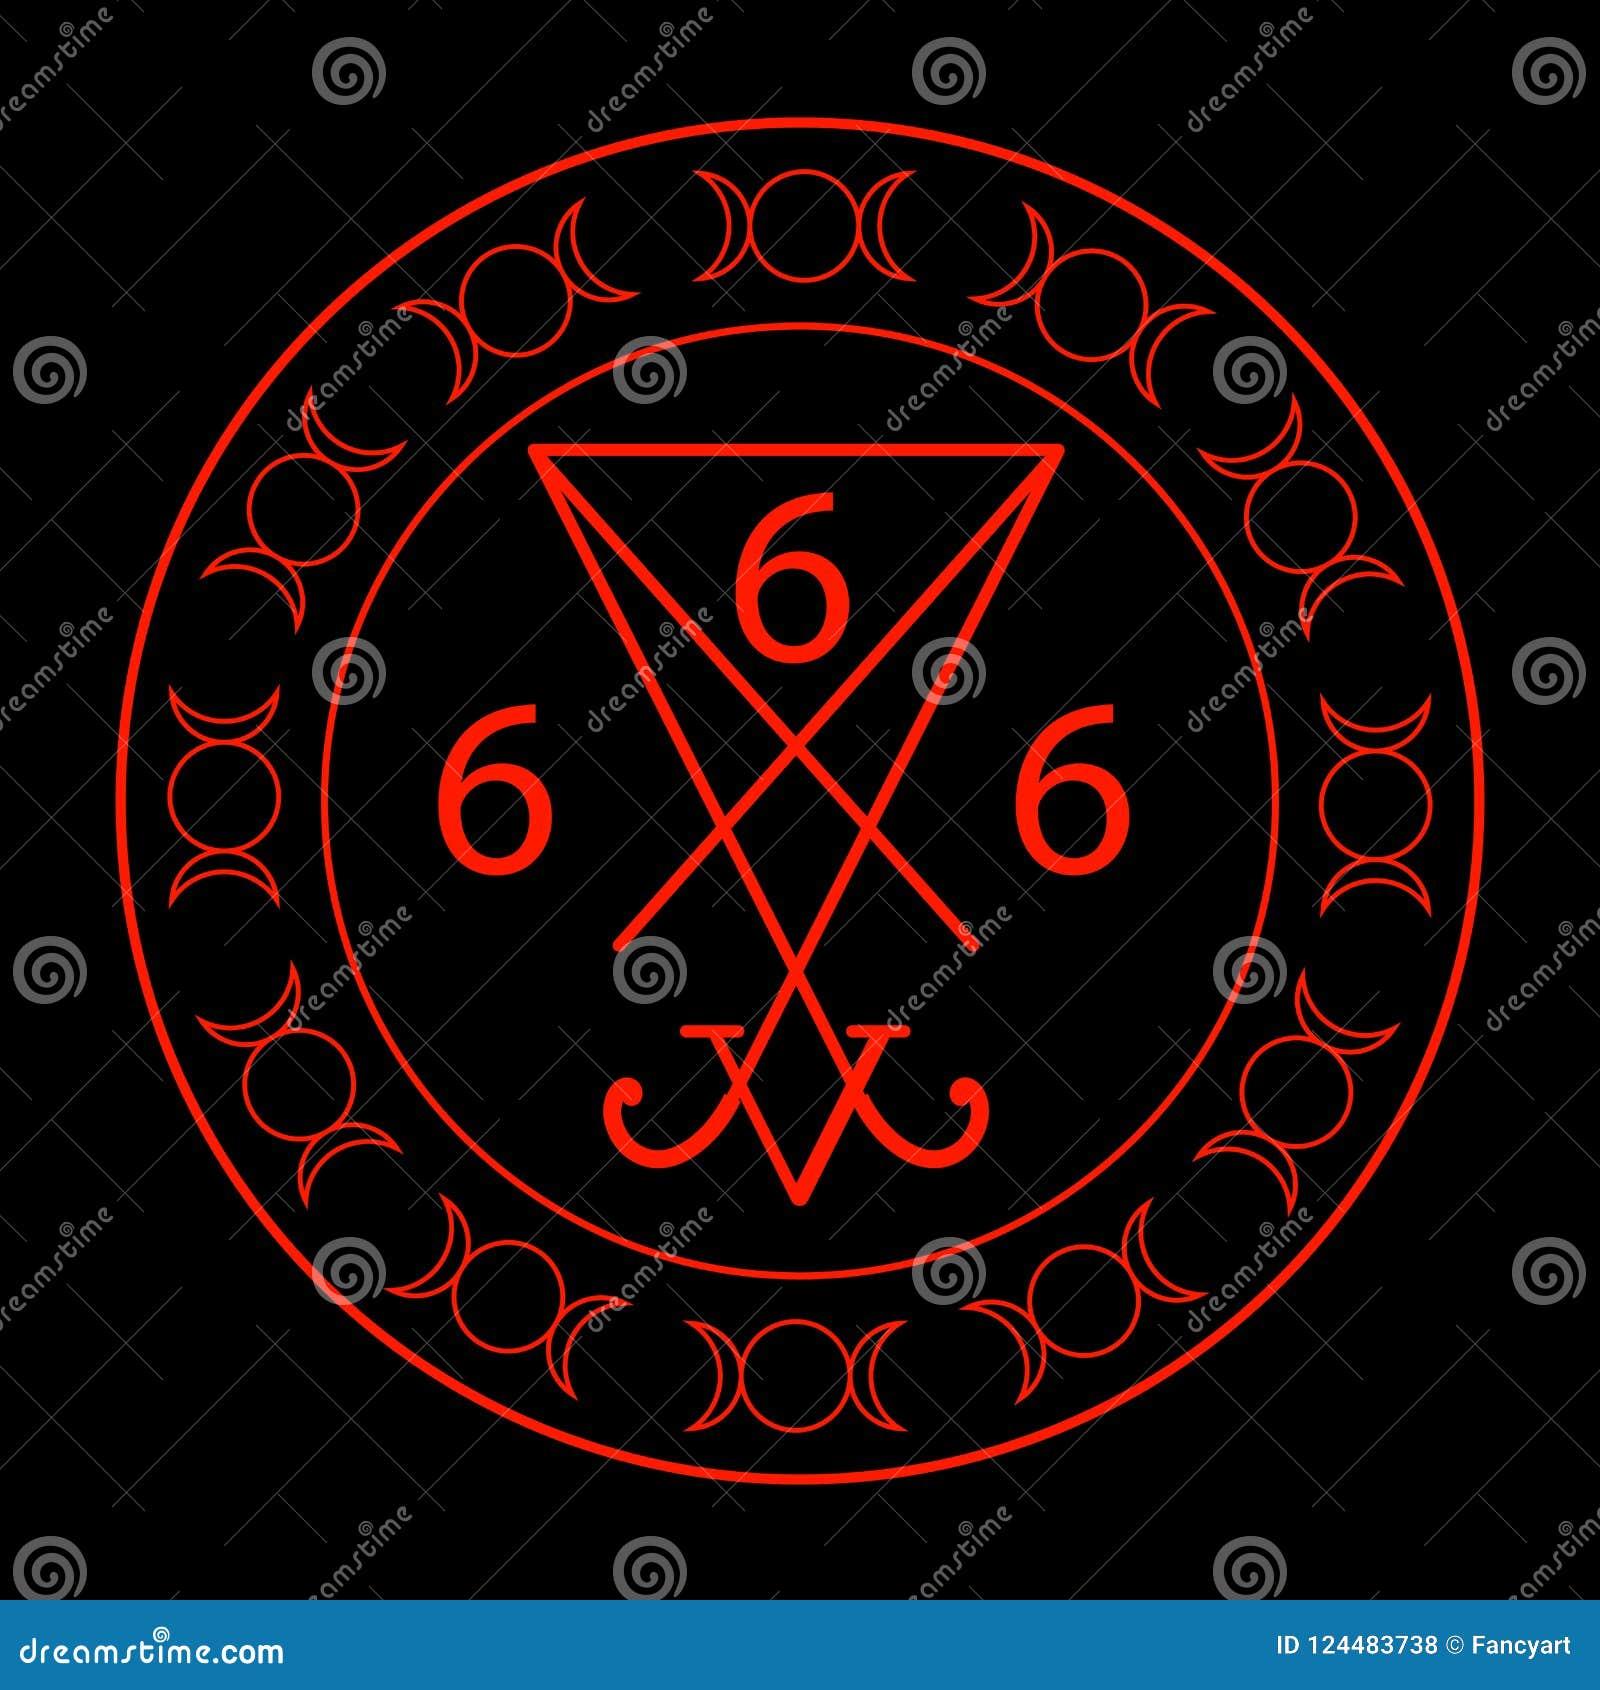 Teufels bedeutung des zahl 666 666